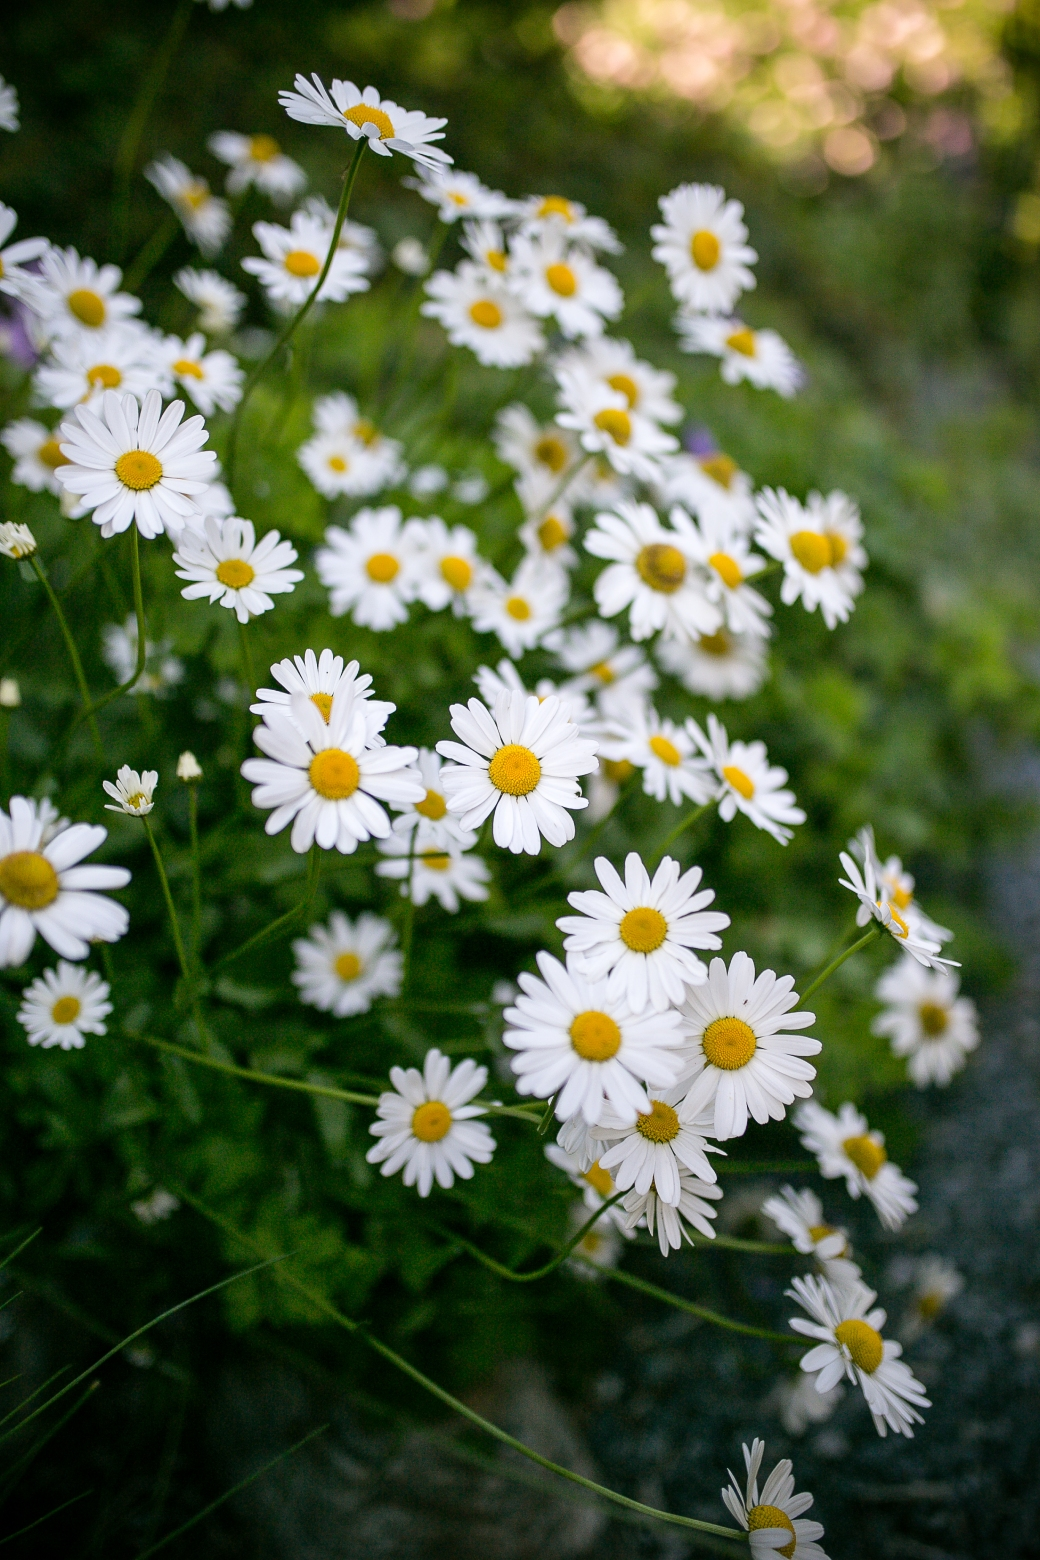 2. Stemningsbilde blomster2